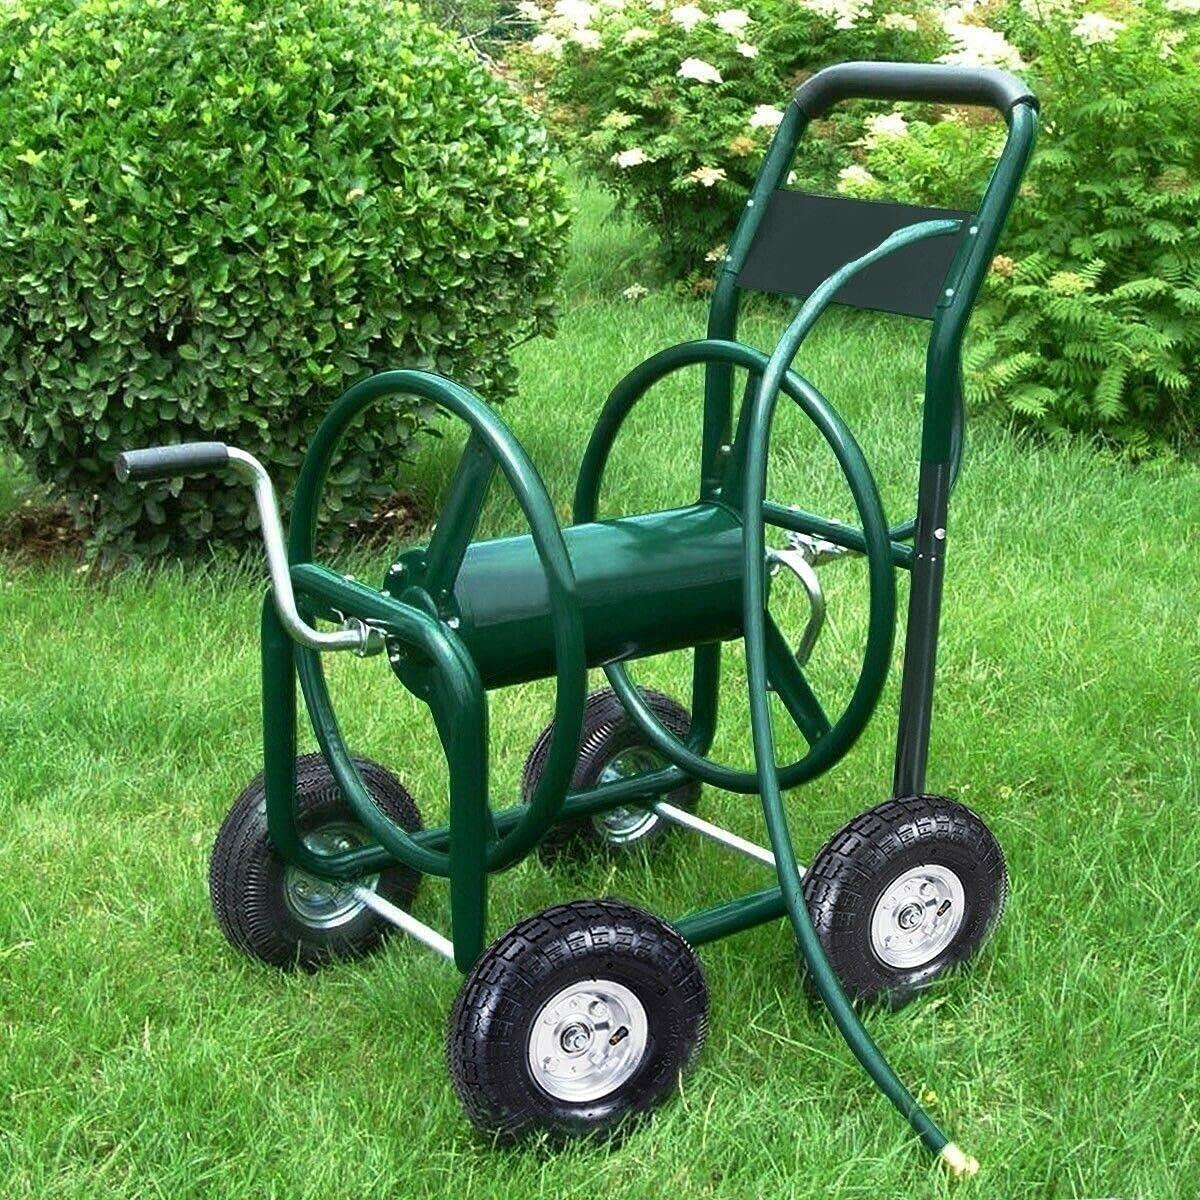 Popular popular 350 ft Garden Yard Water Planting service Reel Gar Cart Hose Home Lawn